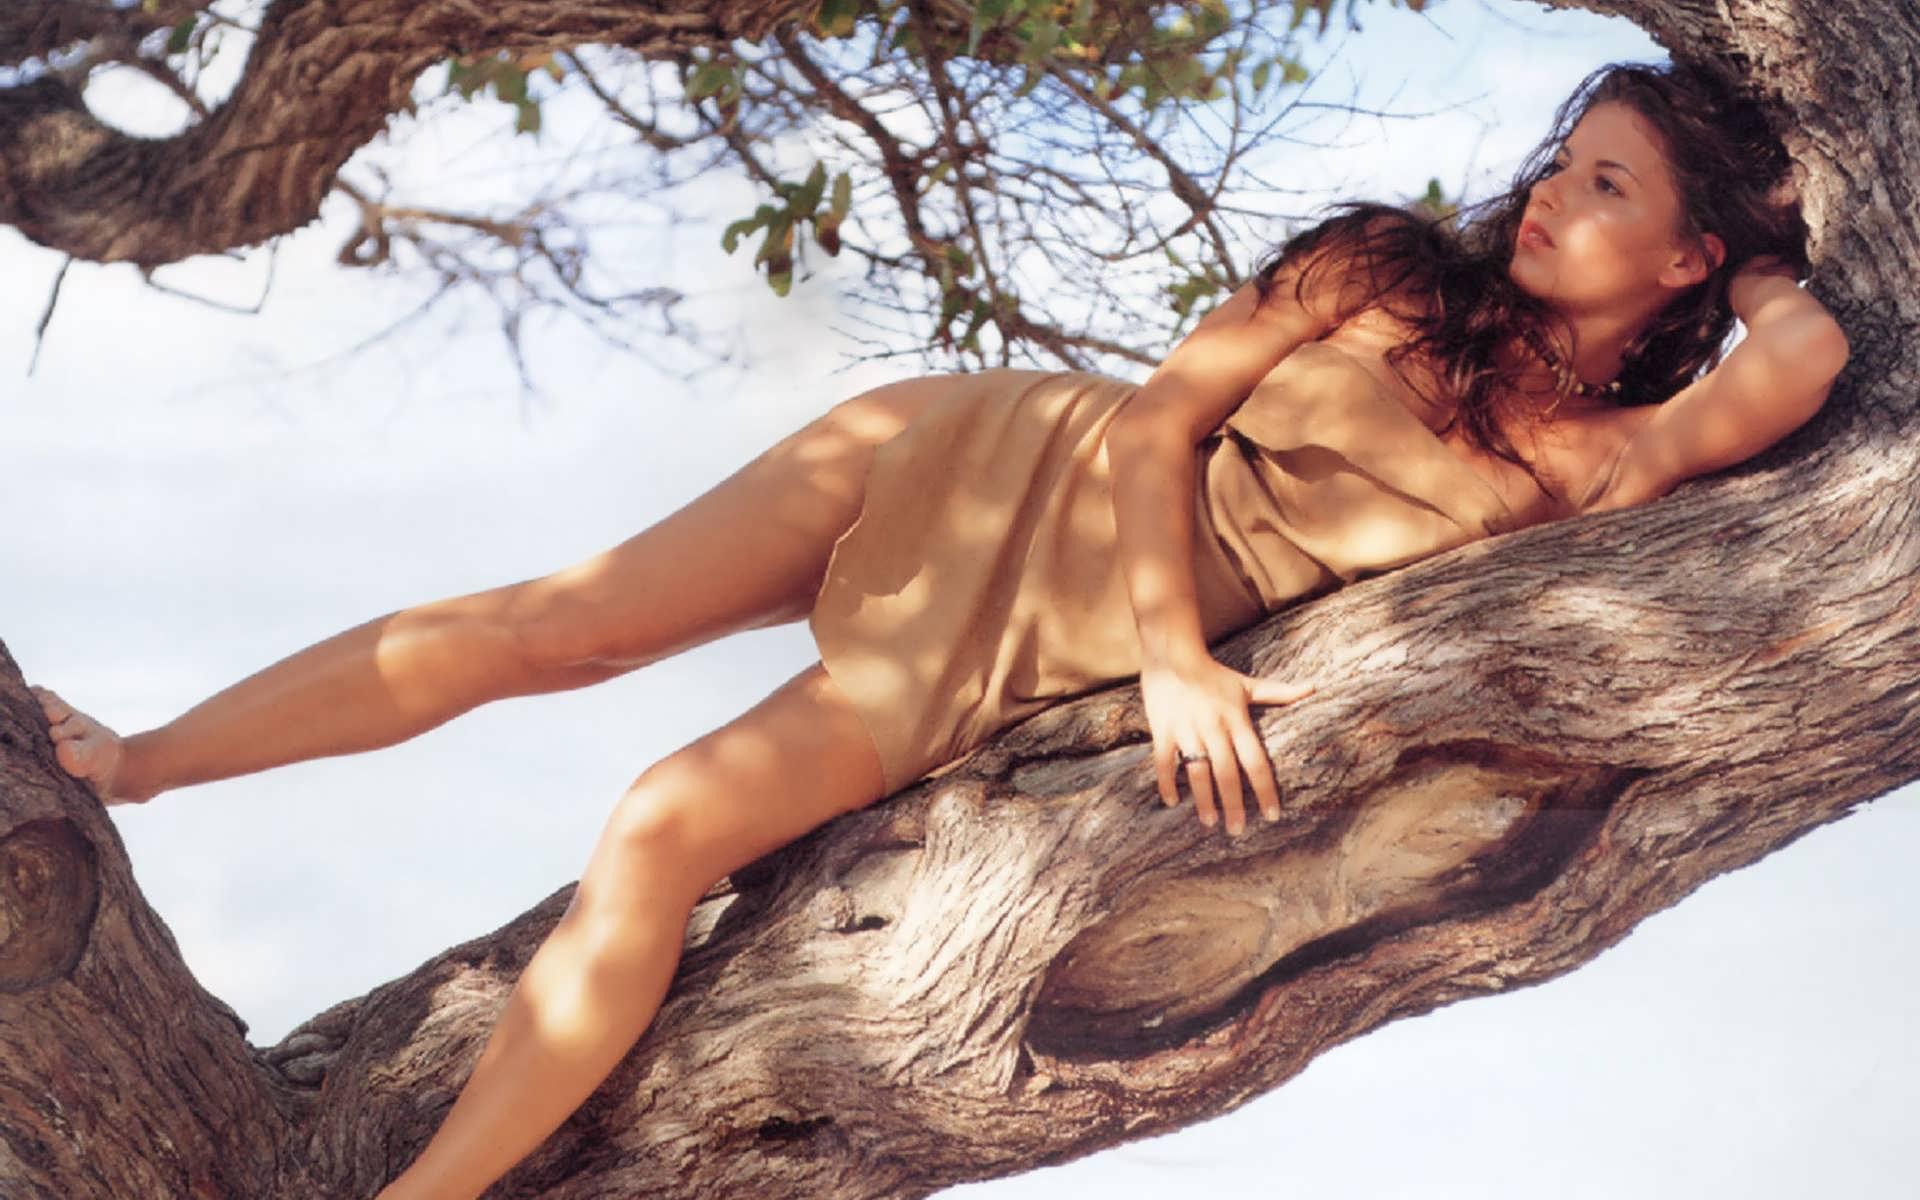 Я на деревце сижу фото девушки в чулках 20 фотография